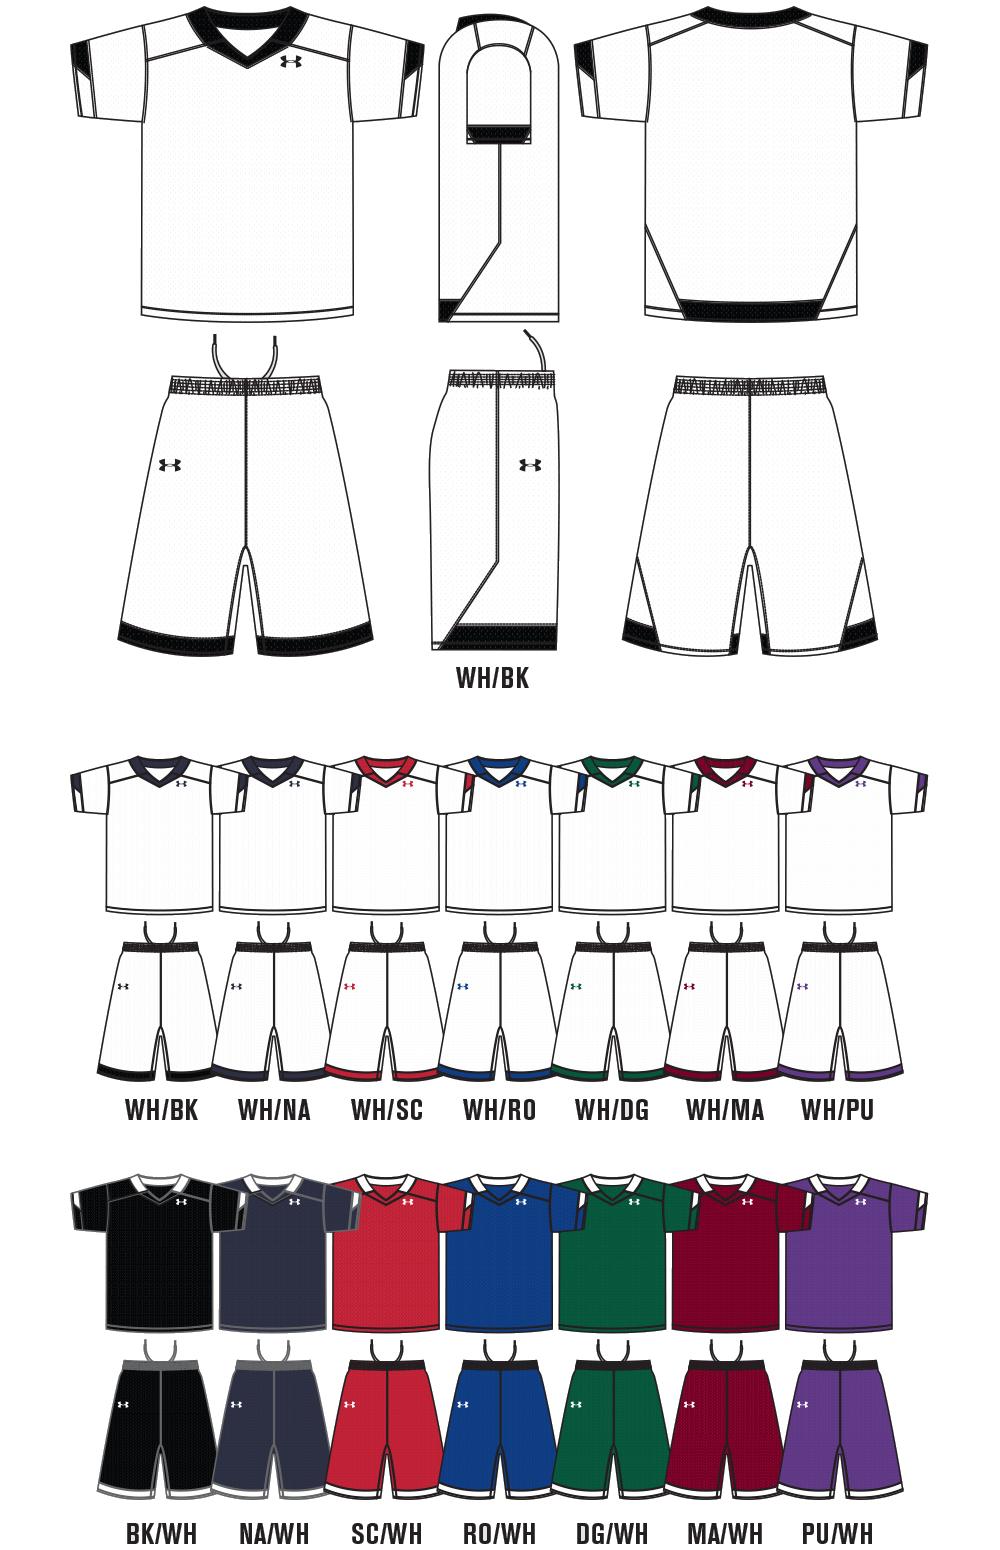 under-armour-toli-custom-lacrosse-uniform.png